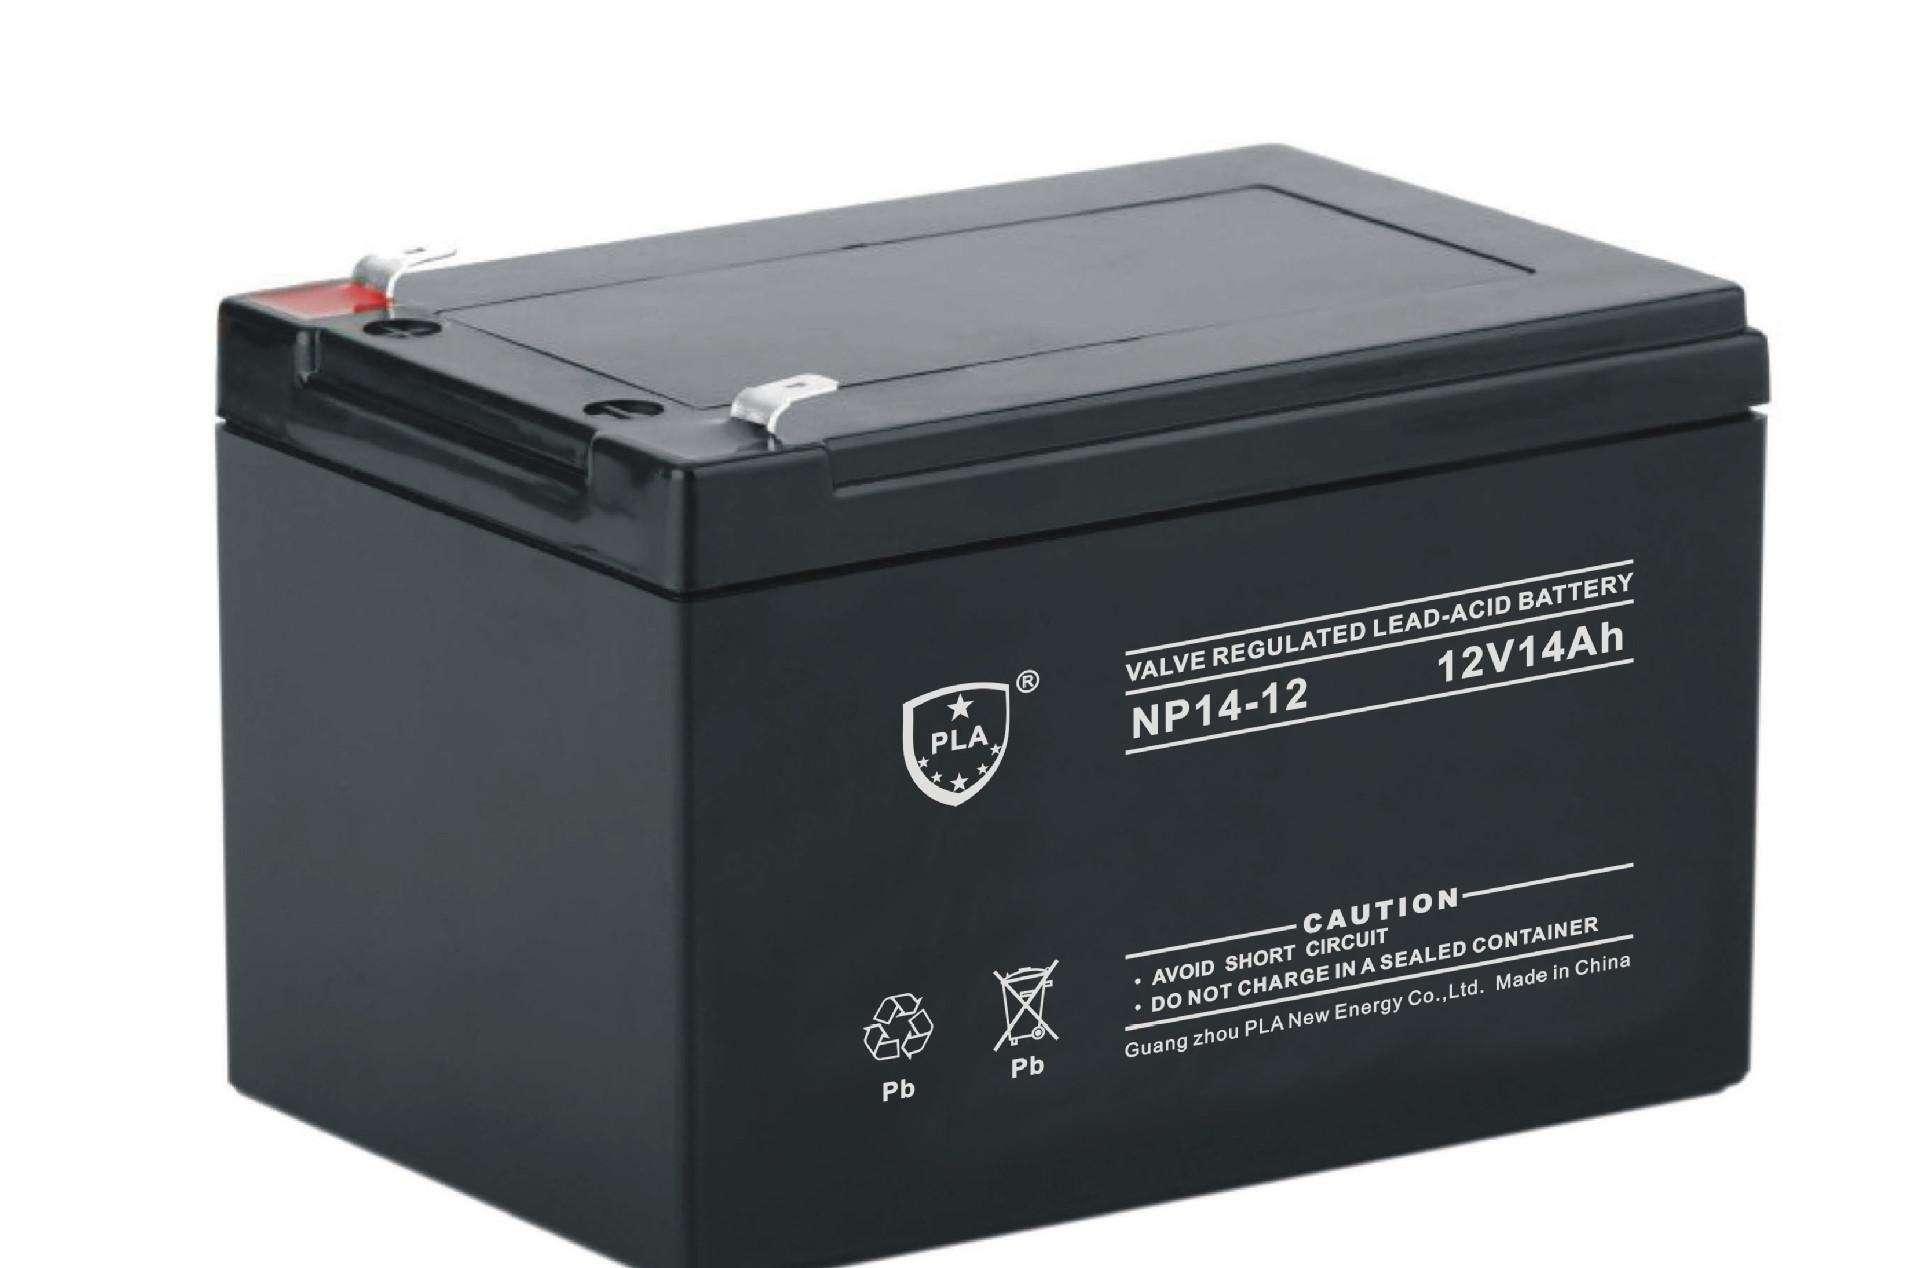 宝鸡Sinonteam赛能蓄电池SN-12V200CH/12V200AH价格